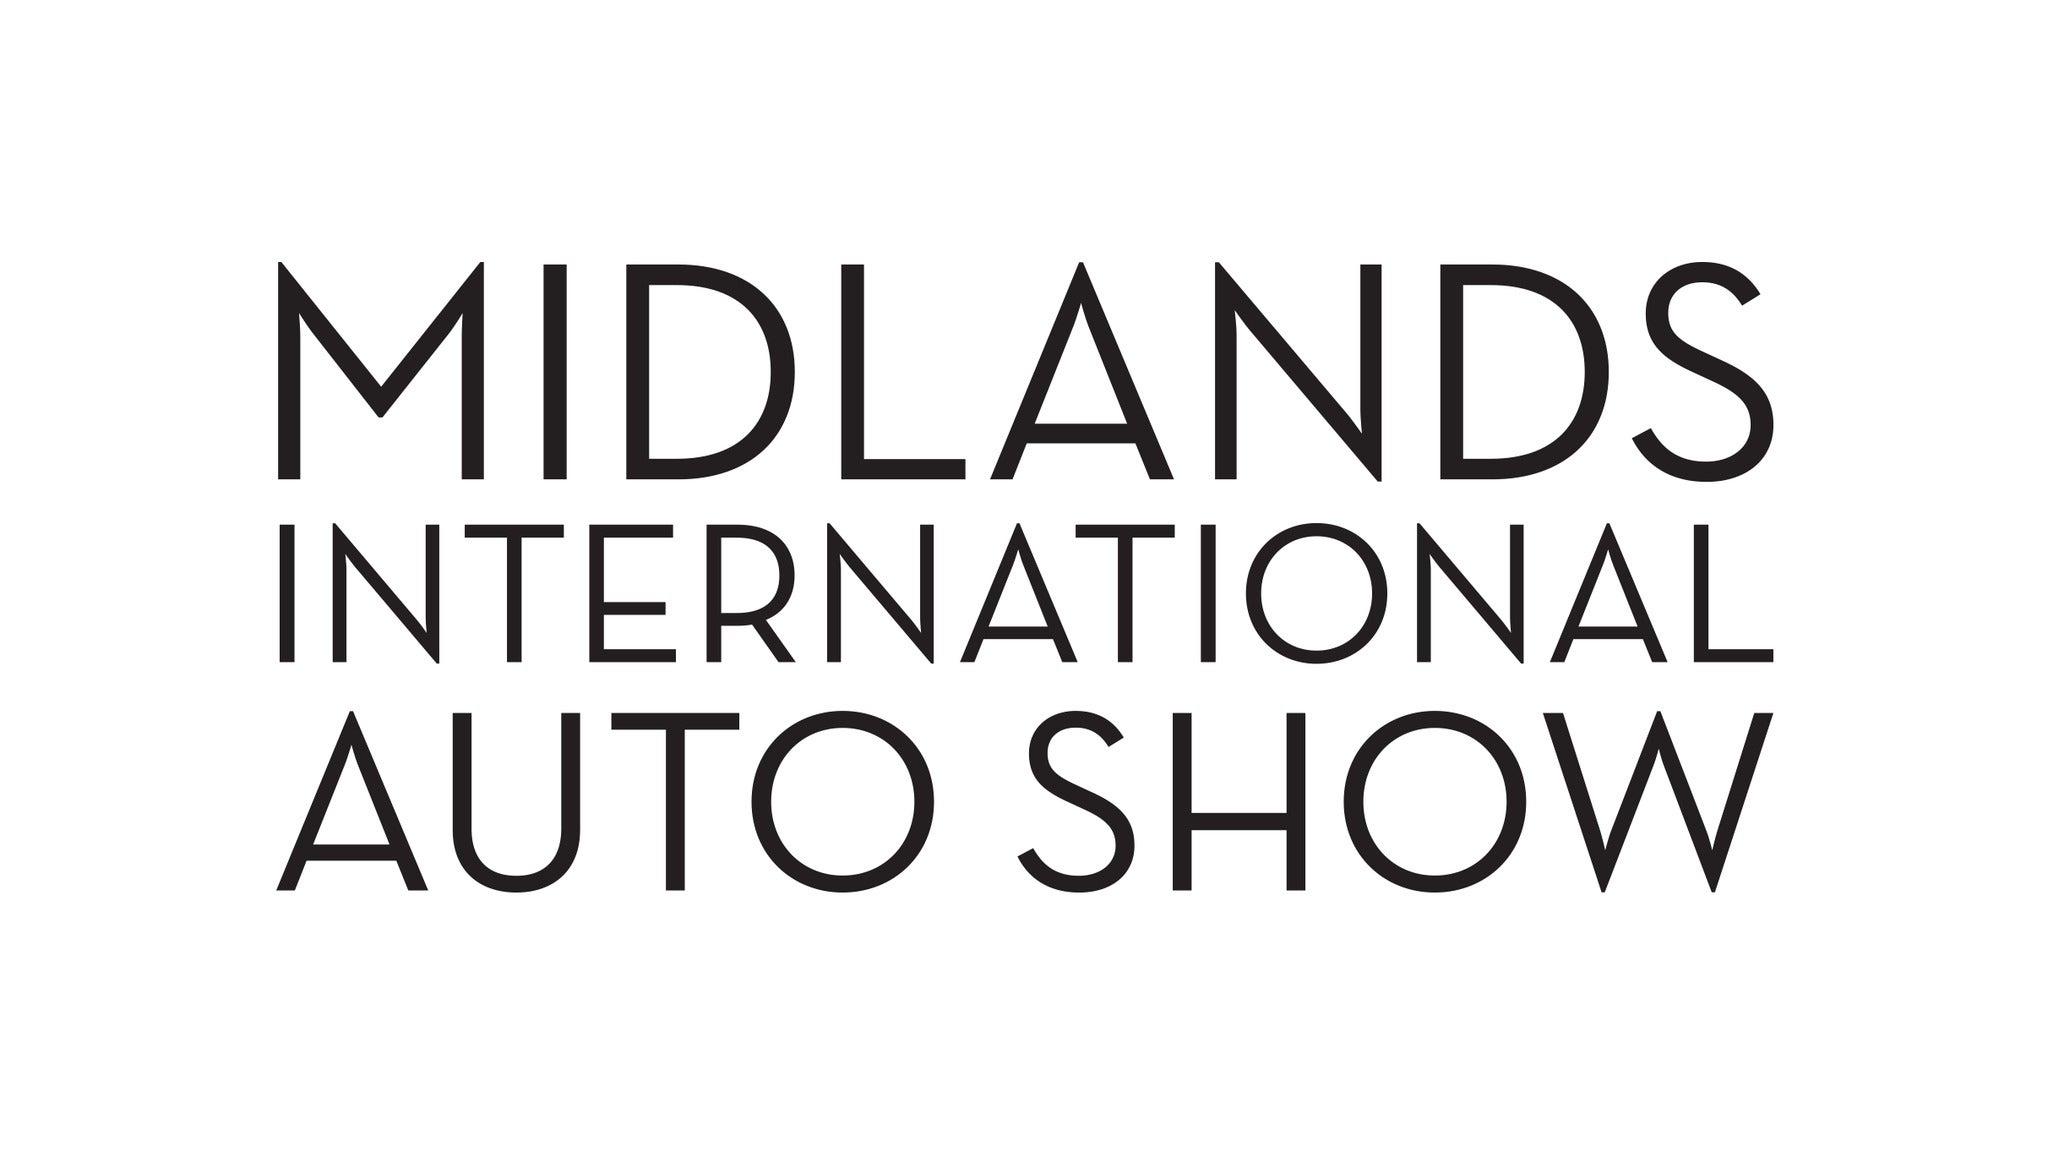 Midlands International Auto Show